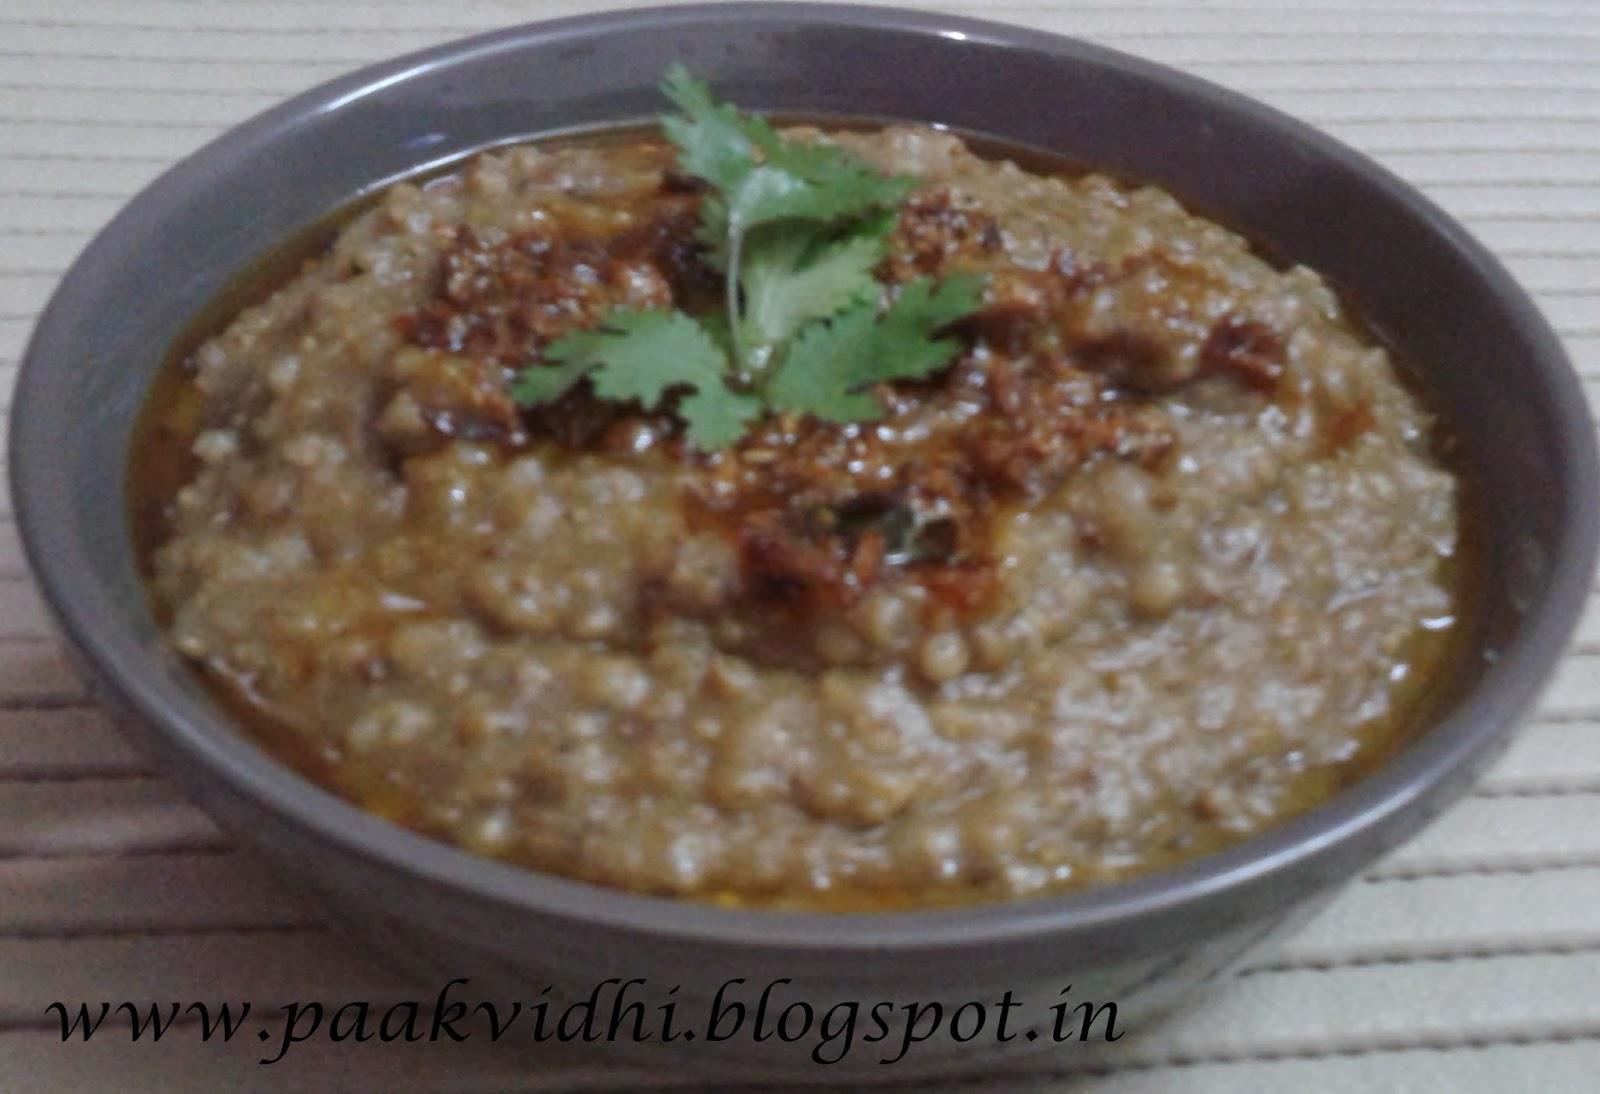 http://paakvidhi.blogspot.in/2014/01/bajre-ki-khichdi.html